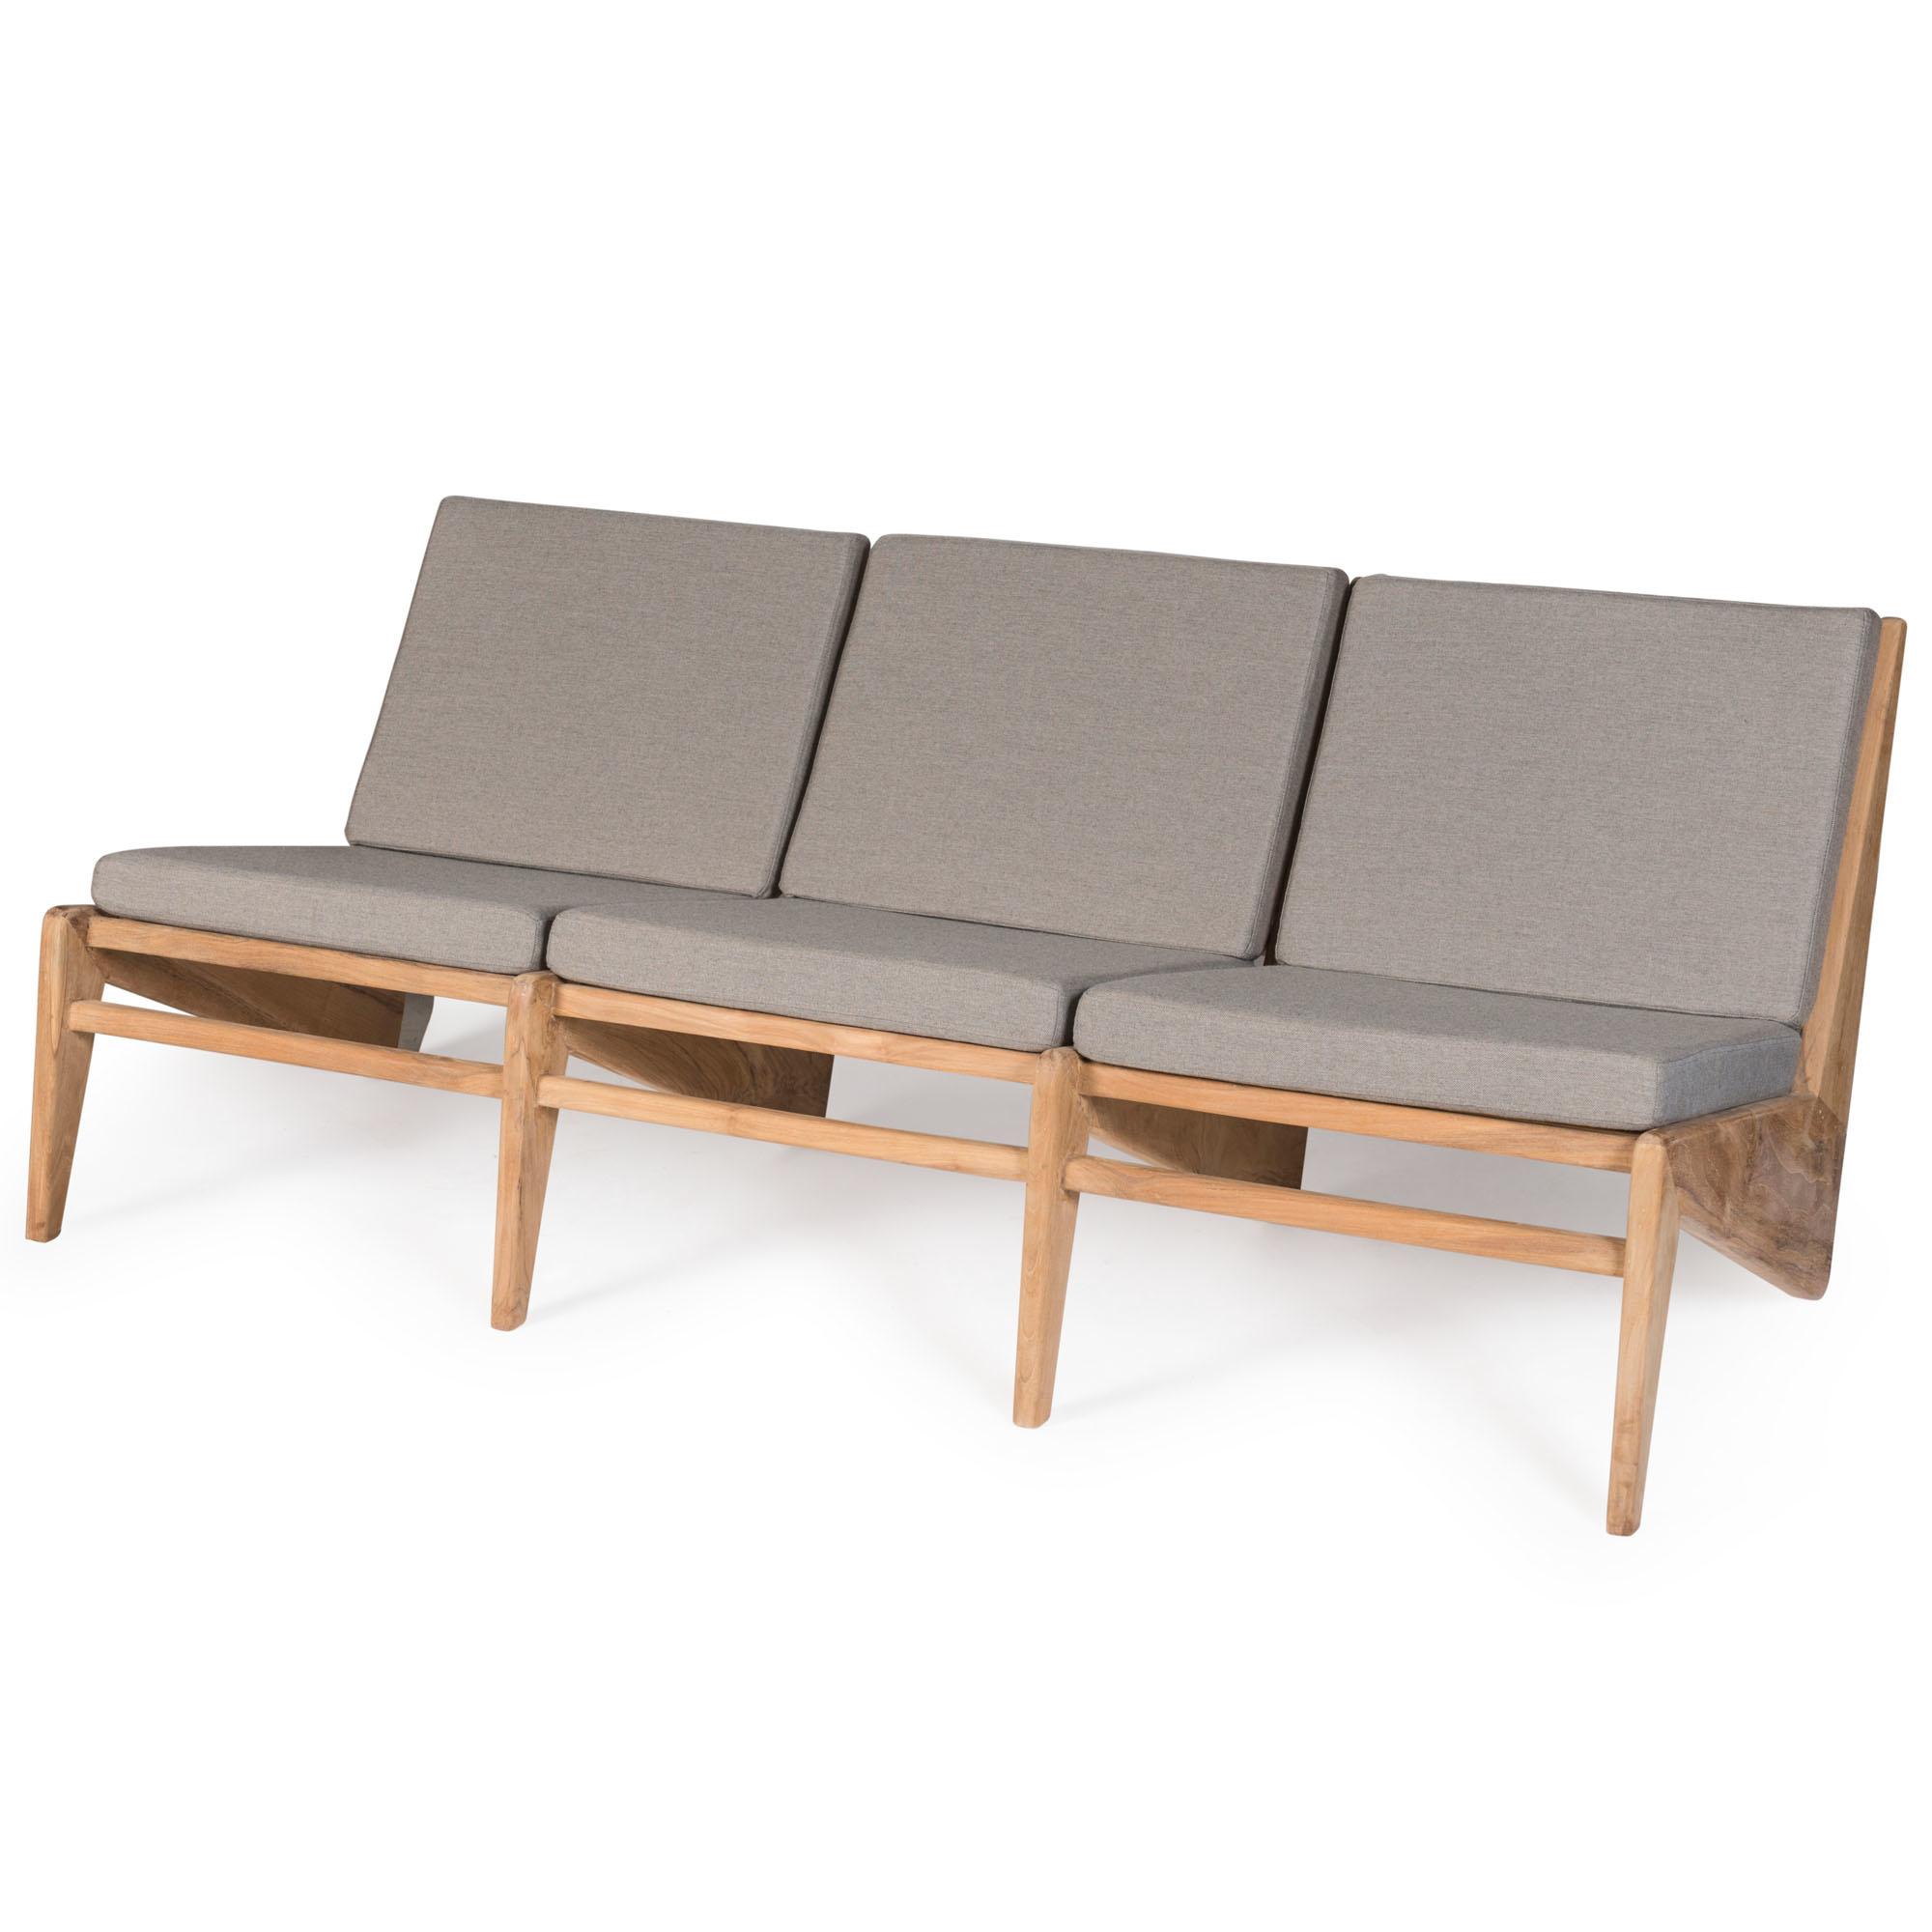 Kangaroo Chair  Bench 3 - Teak Outdoor with Cushion-1